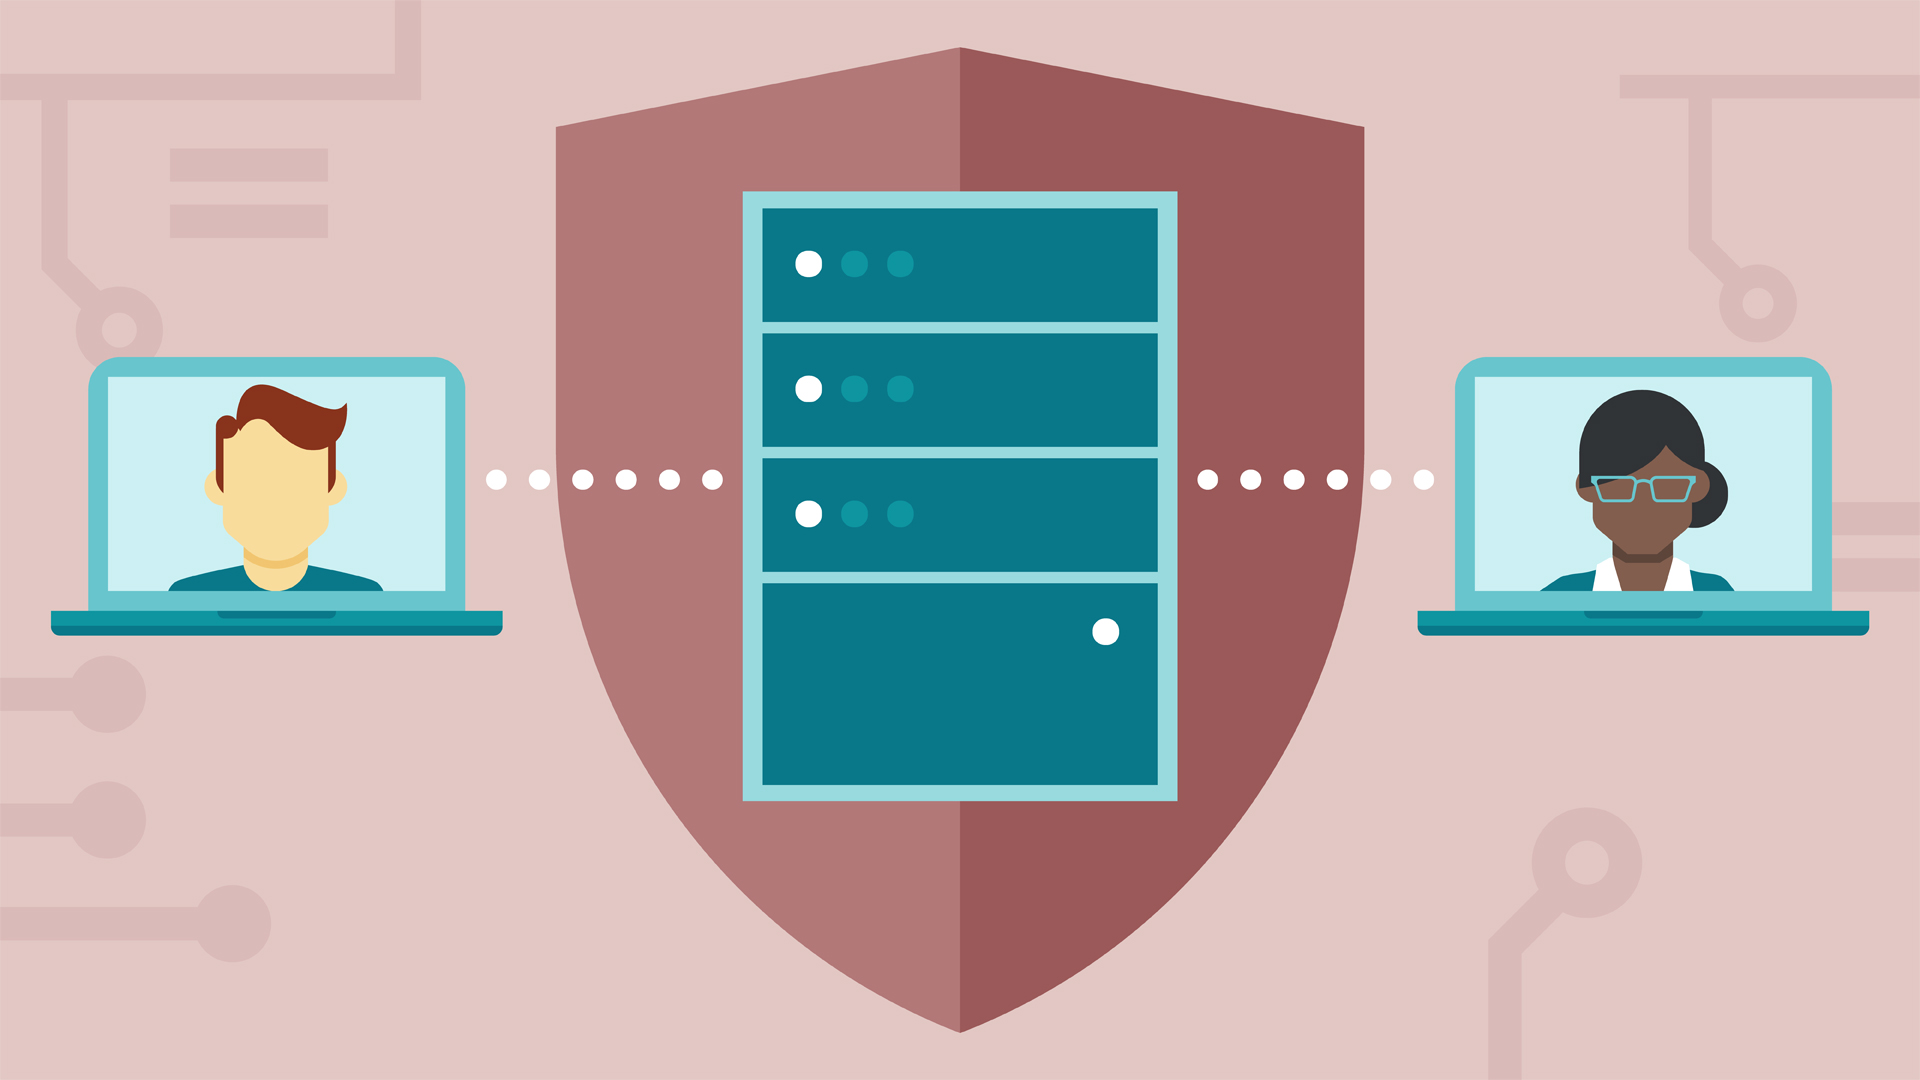 Providing server and domain isolation